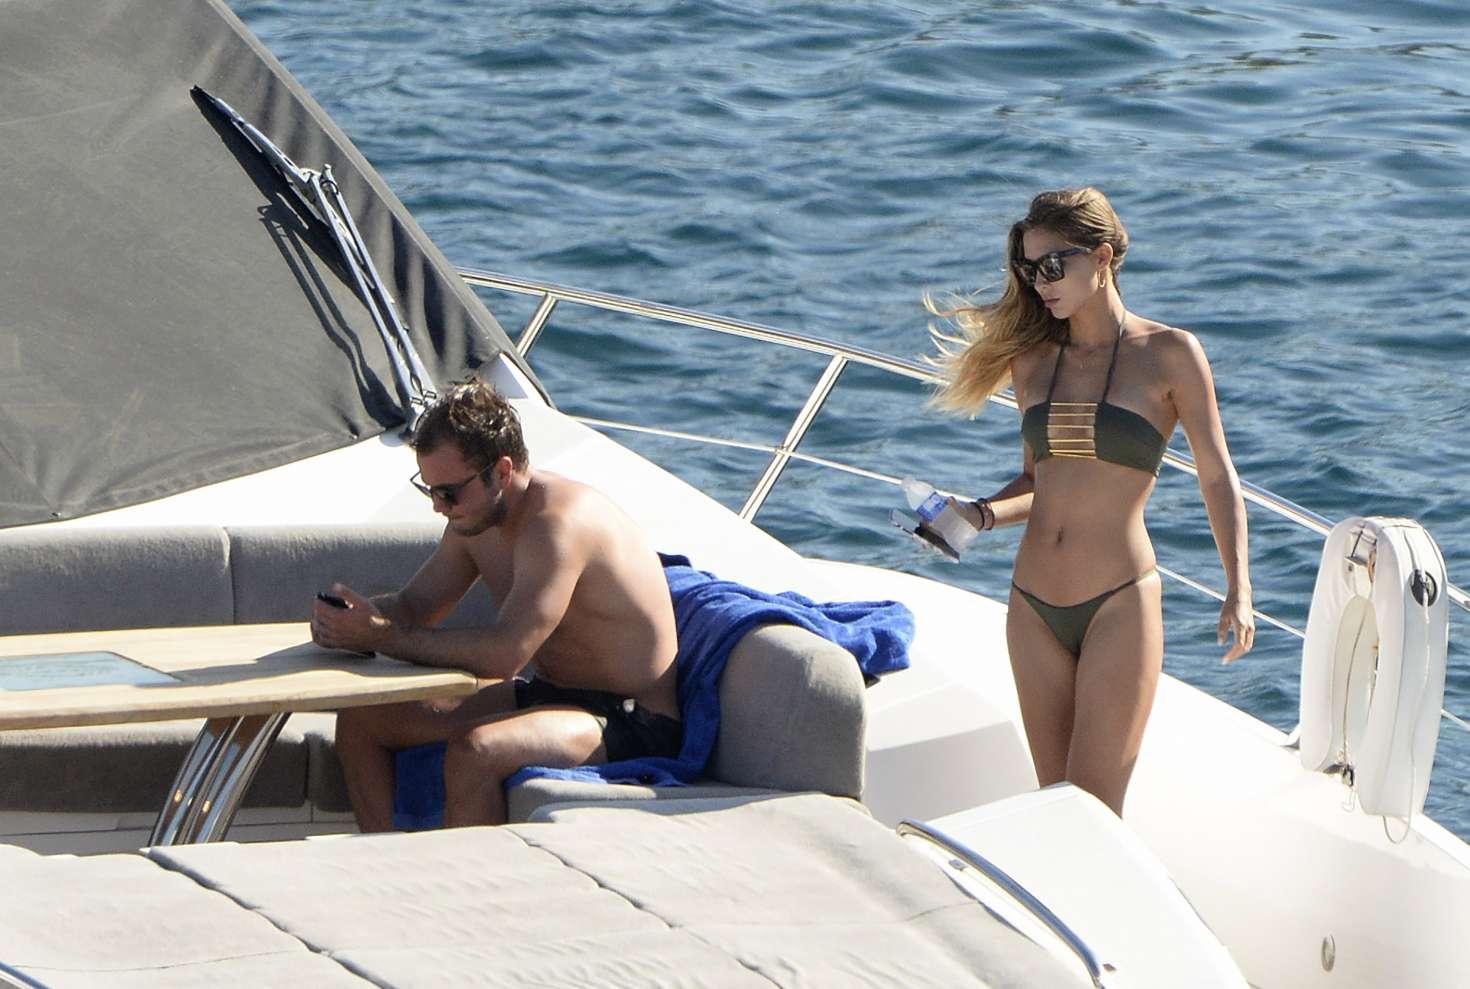 Ann-Kathrin Brommel 2017 : Ann-Kathrin Brommel: Hot in a bikini while on a yacht in Mallorca-23